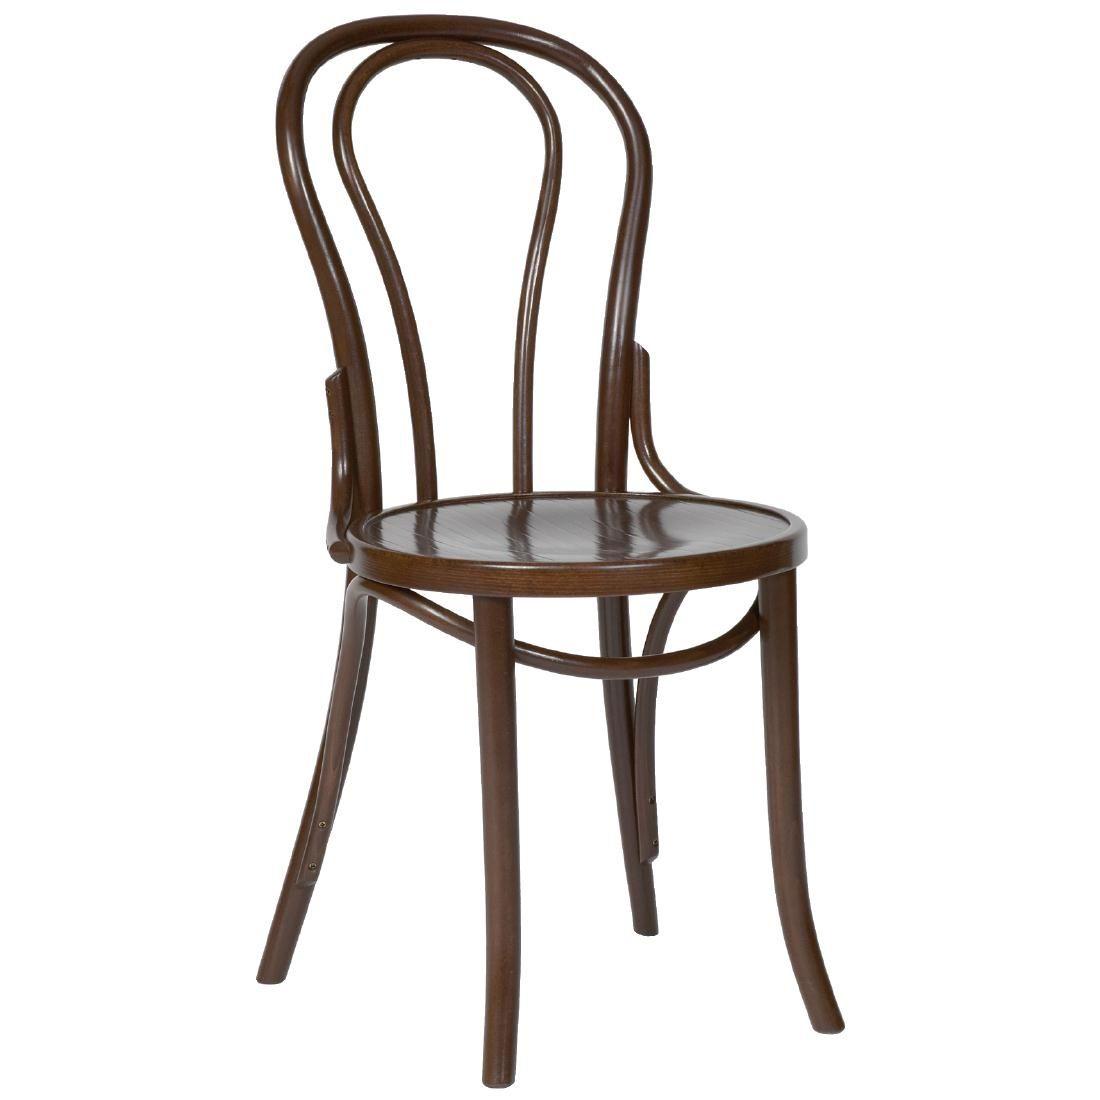 Bentwood bistro chair - Fameg Bentwood Bistro Sidechair Walnut Finish Pack Of 2